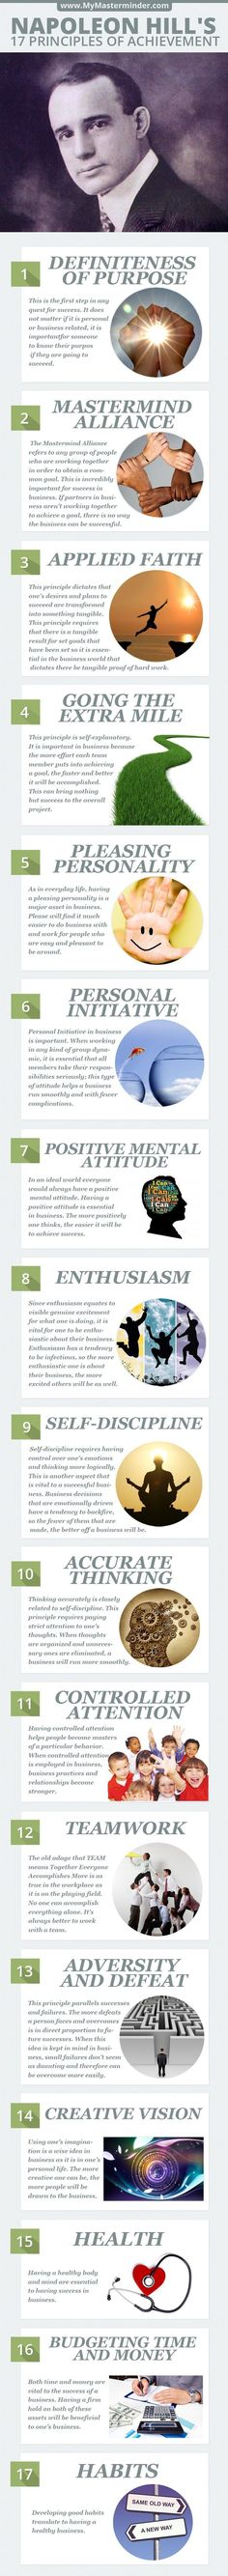 Napoleon Hill's 17 Principles of Personal Achievement, Leadership Leadership Development, Self Development, Personal Development, Napoleon Hill, Life Skills, Life Lessons, Lessons Learned, Personal Achievements, Success Principles